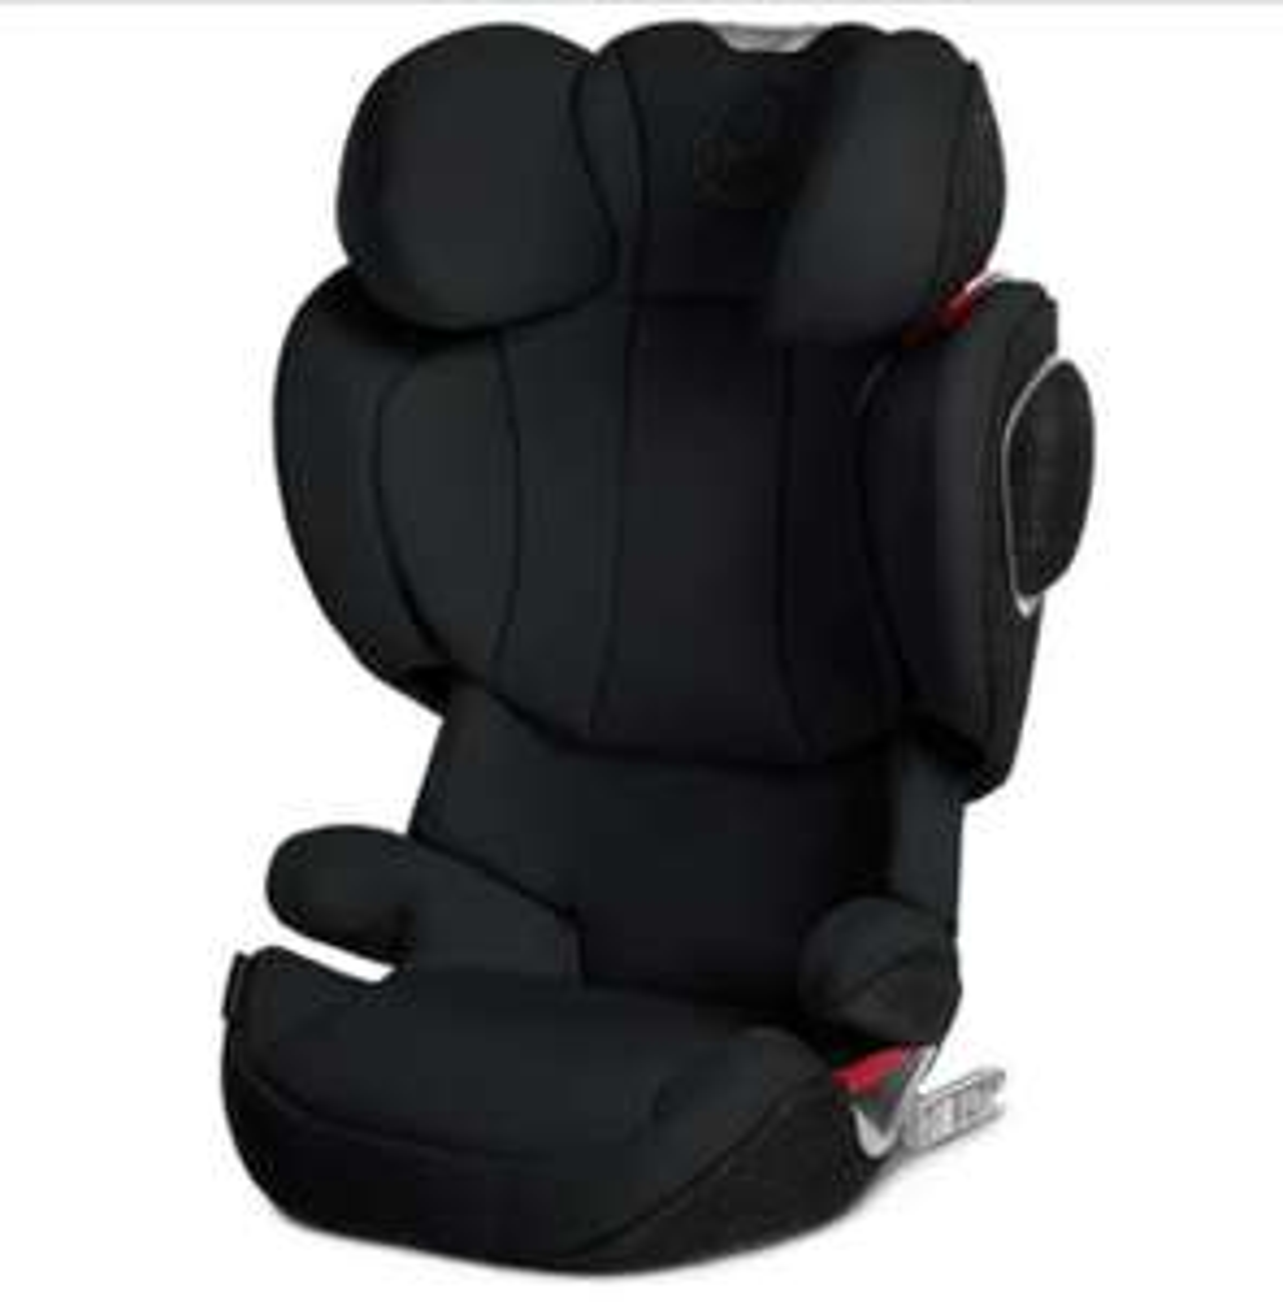 Cybex Platinum Solution Z-Fix Group 2/3 car seat - £129.99 @ PramWorld